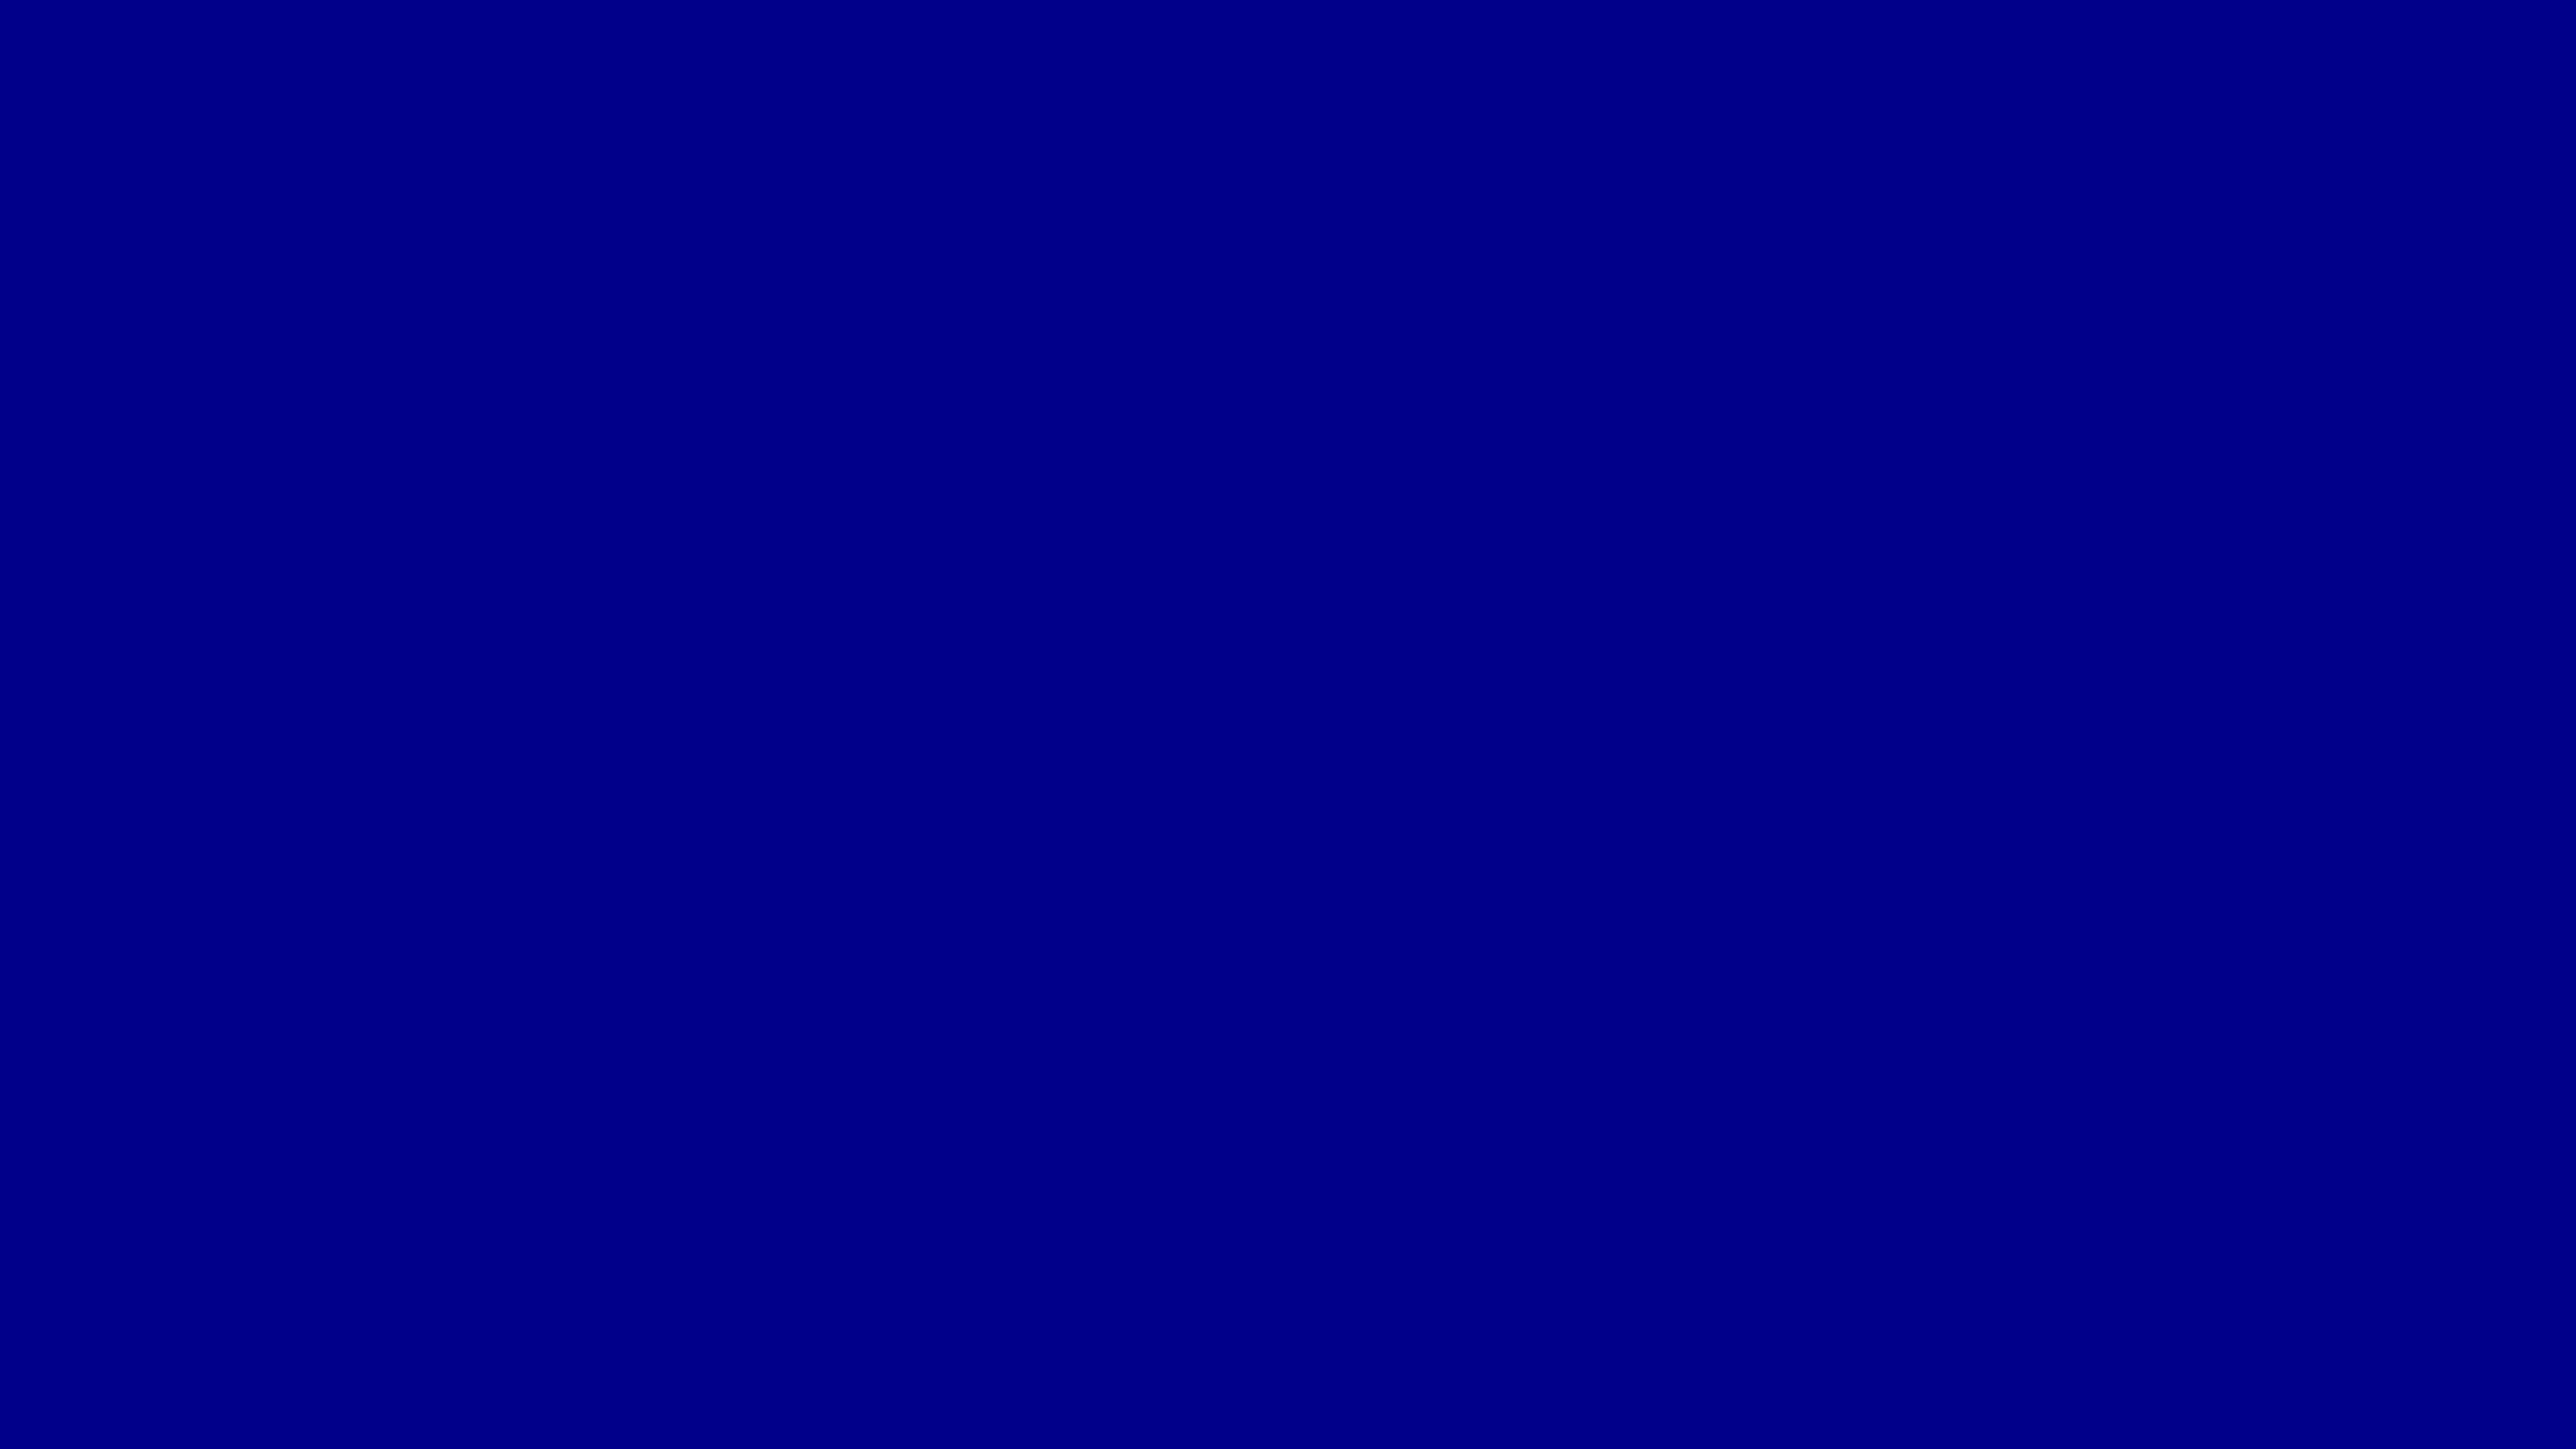 4096x2304 Dark Blue Solid Color Background